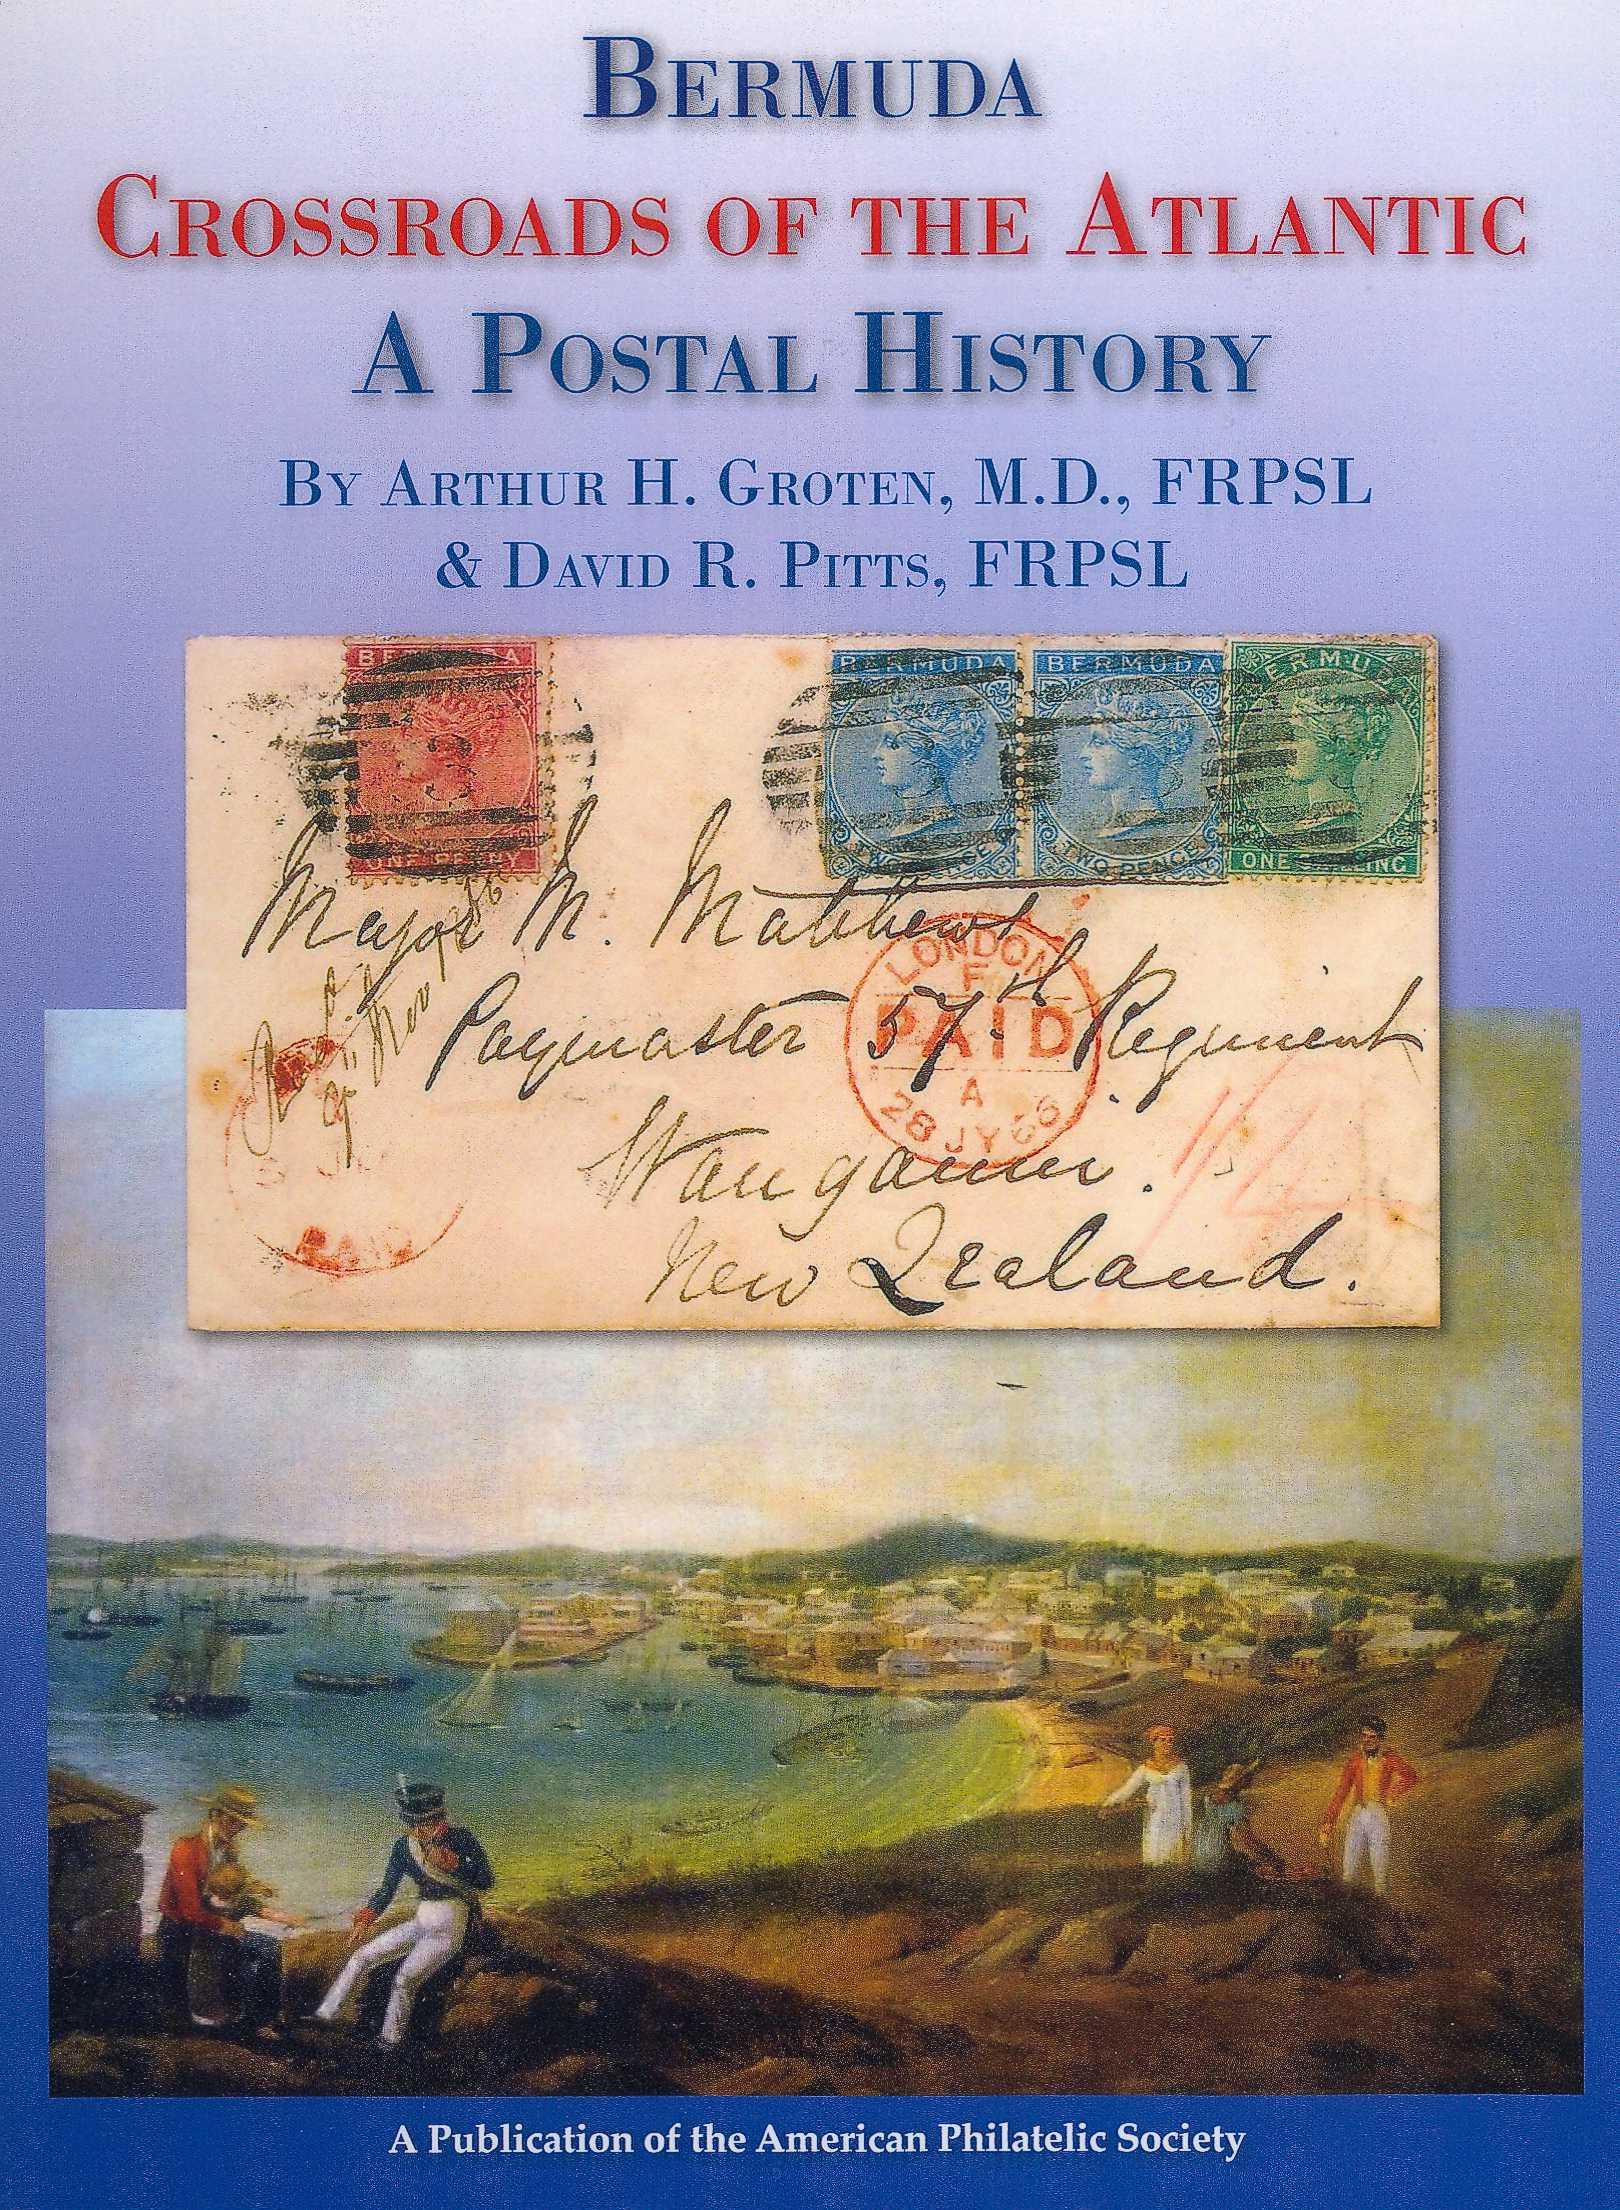 New and Recent Philatelic Books